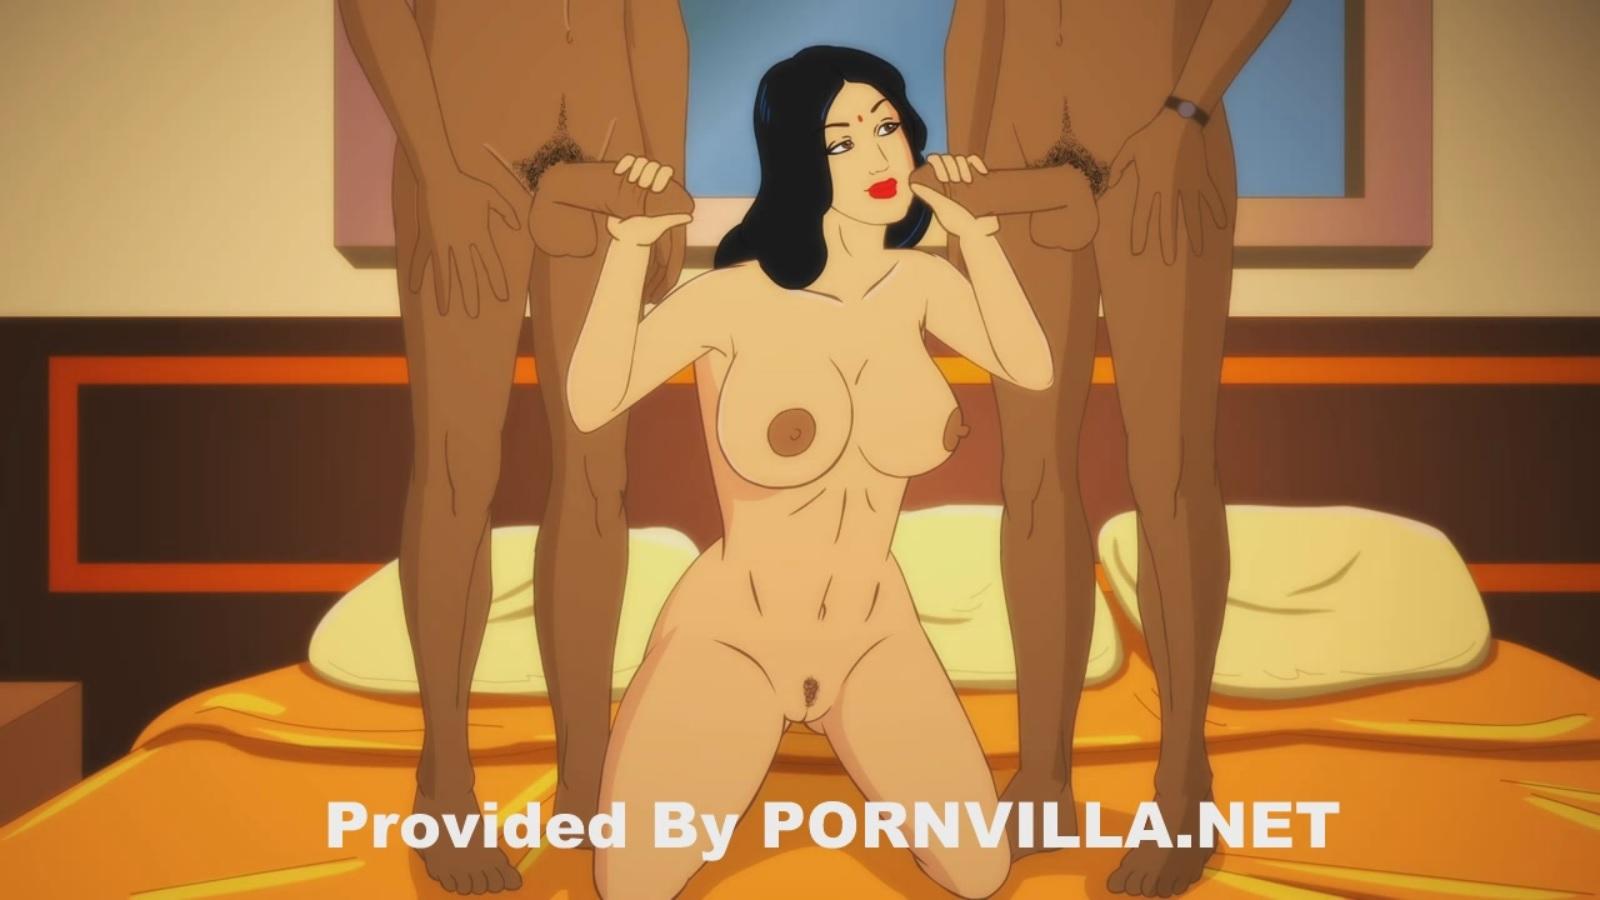 Naughty nude models